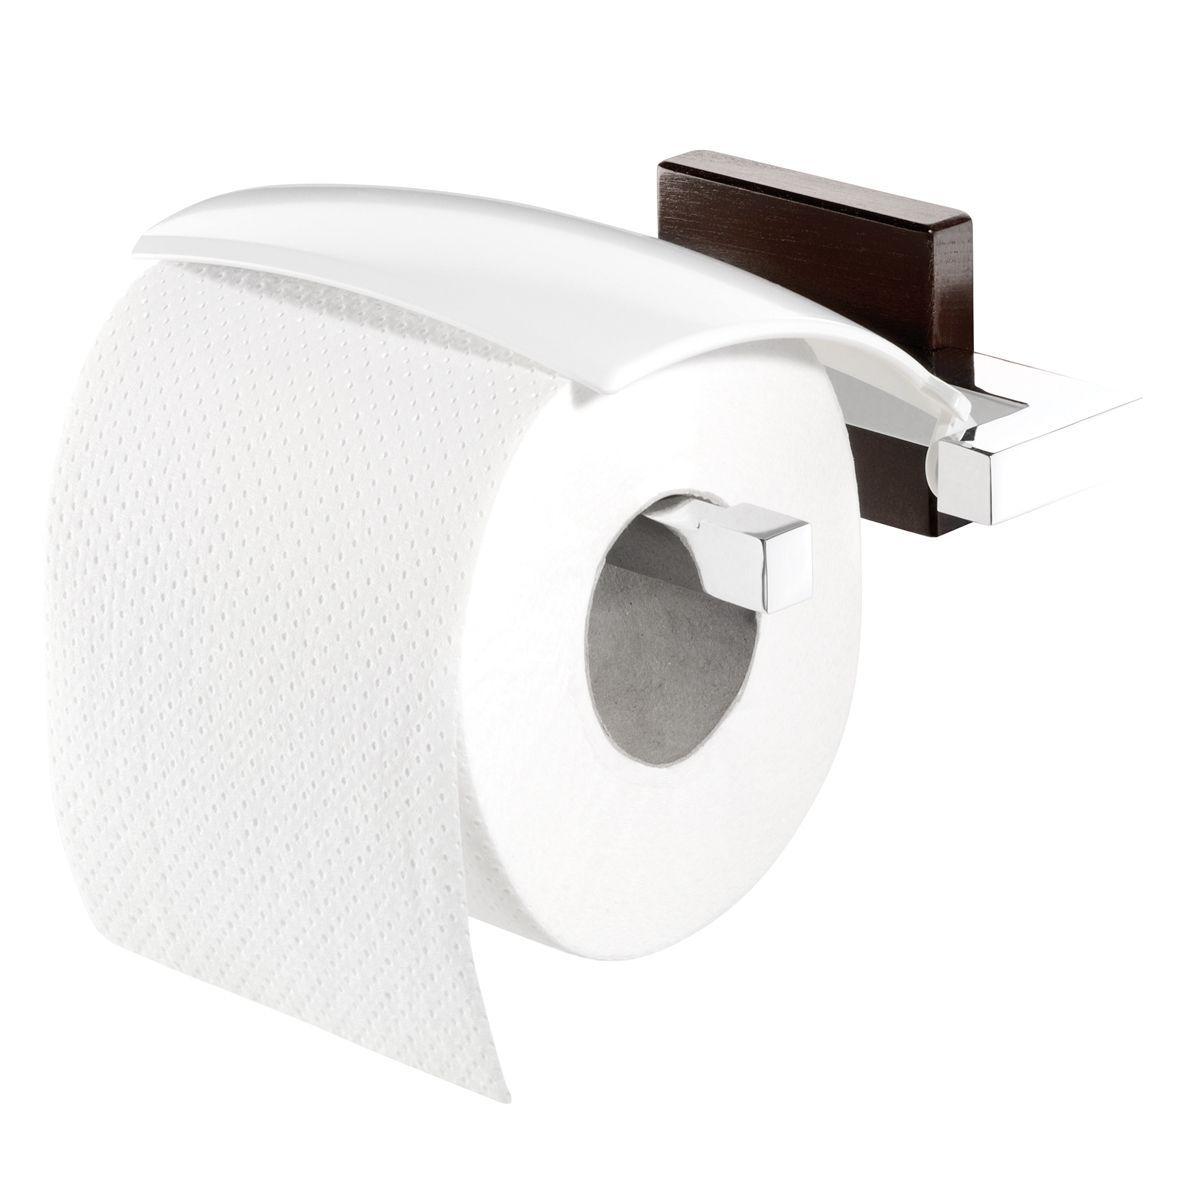 Tiger Zenna toiletrolhouder met klep chroom/wengé